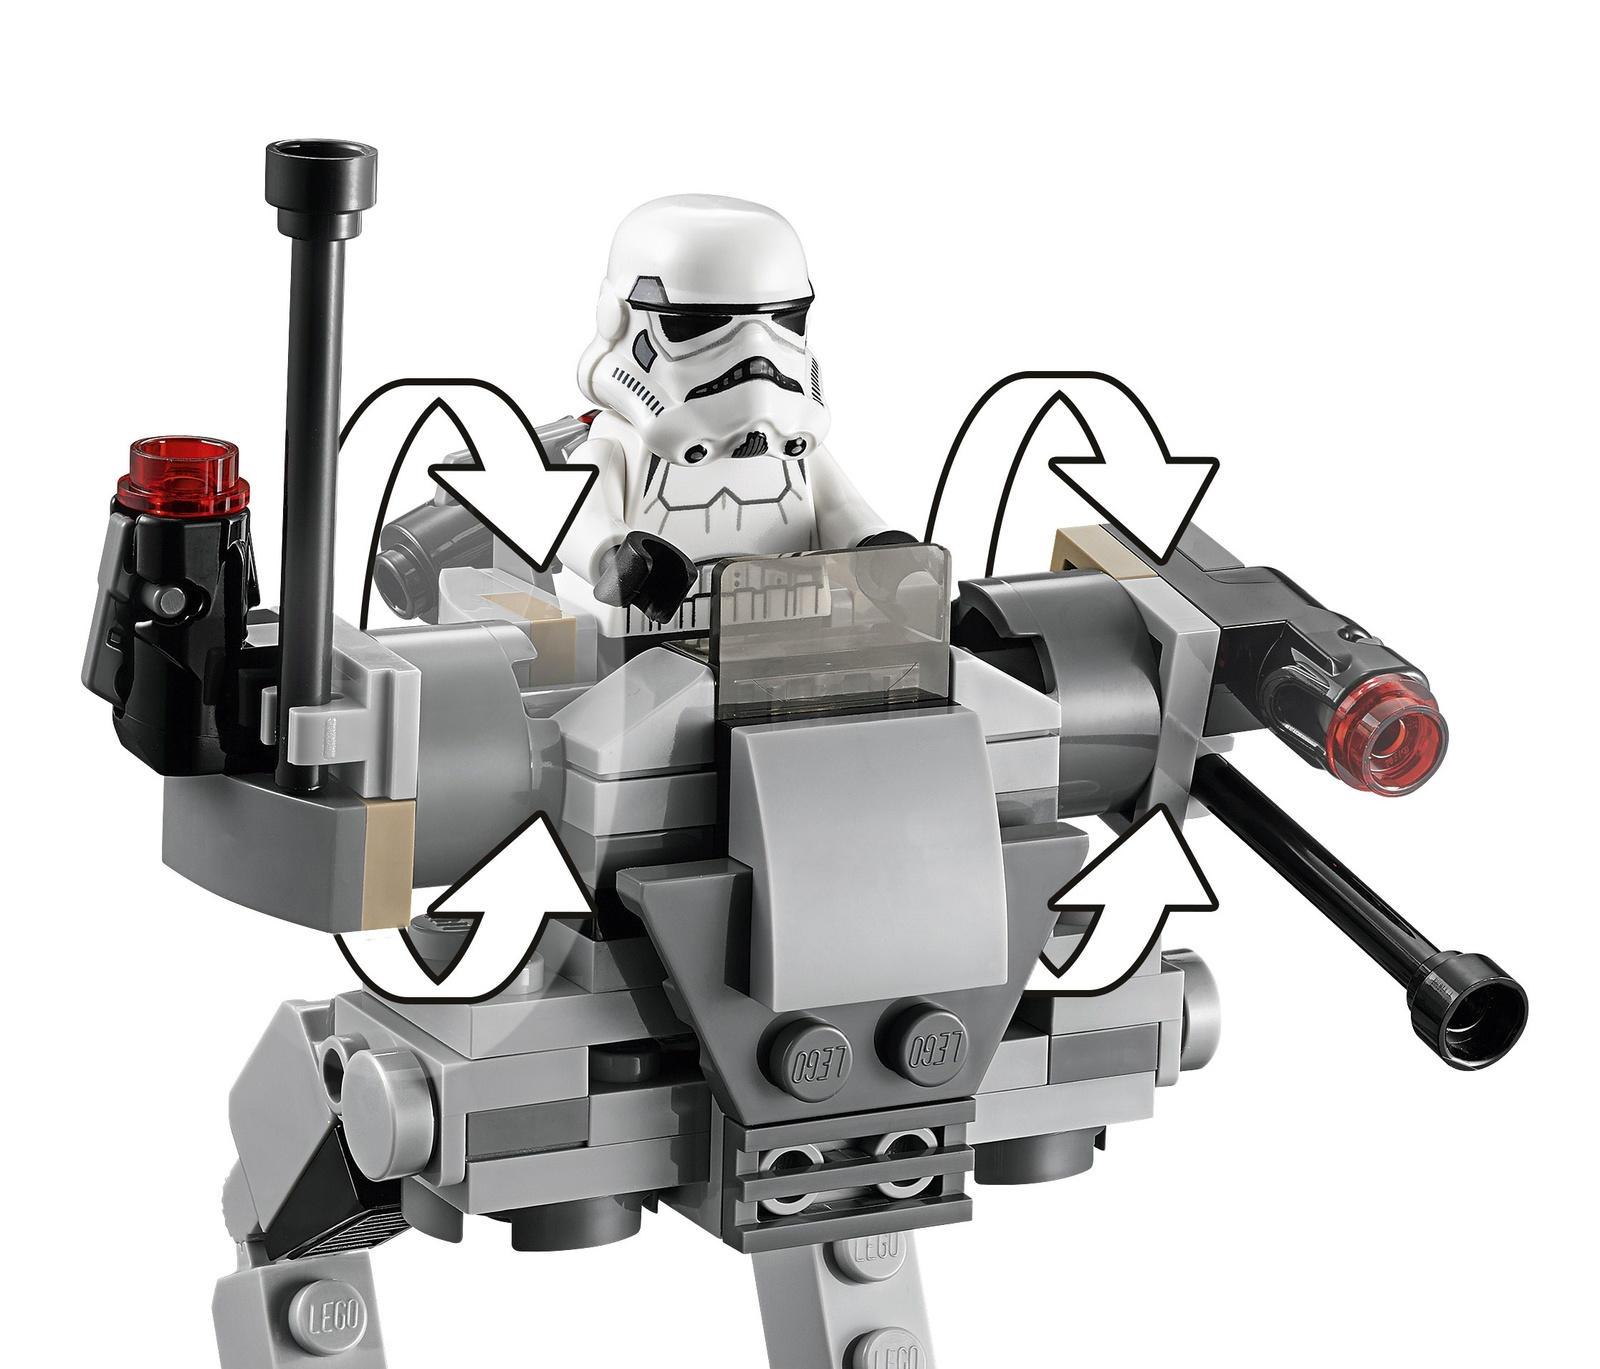 Lego Star Wars Battles 0 30 Apk: LEGO Star Wars: Imperial Trooper Battle Pack (75165)